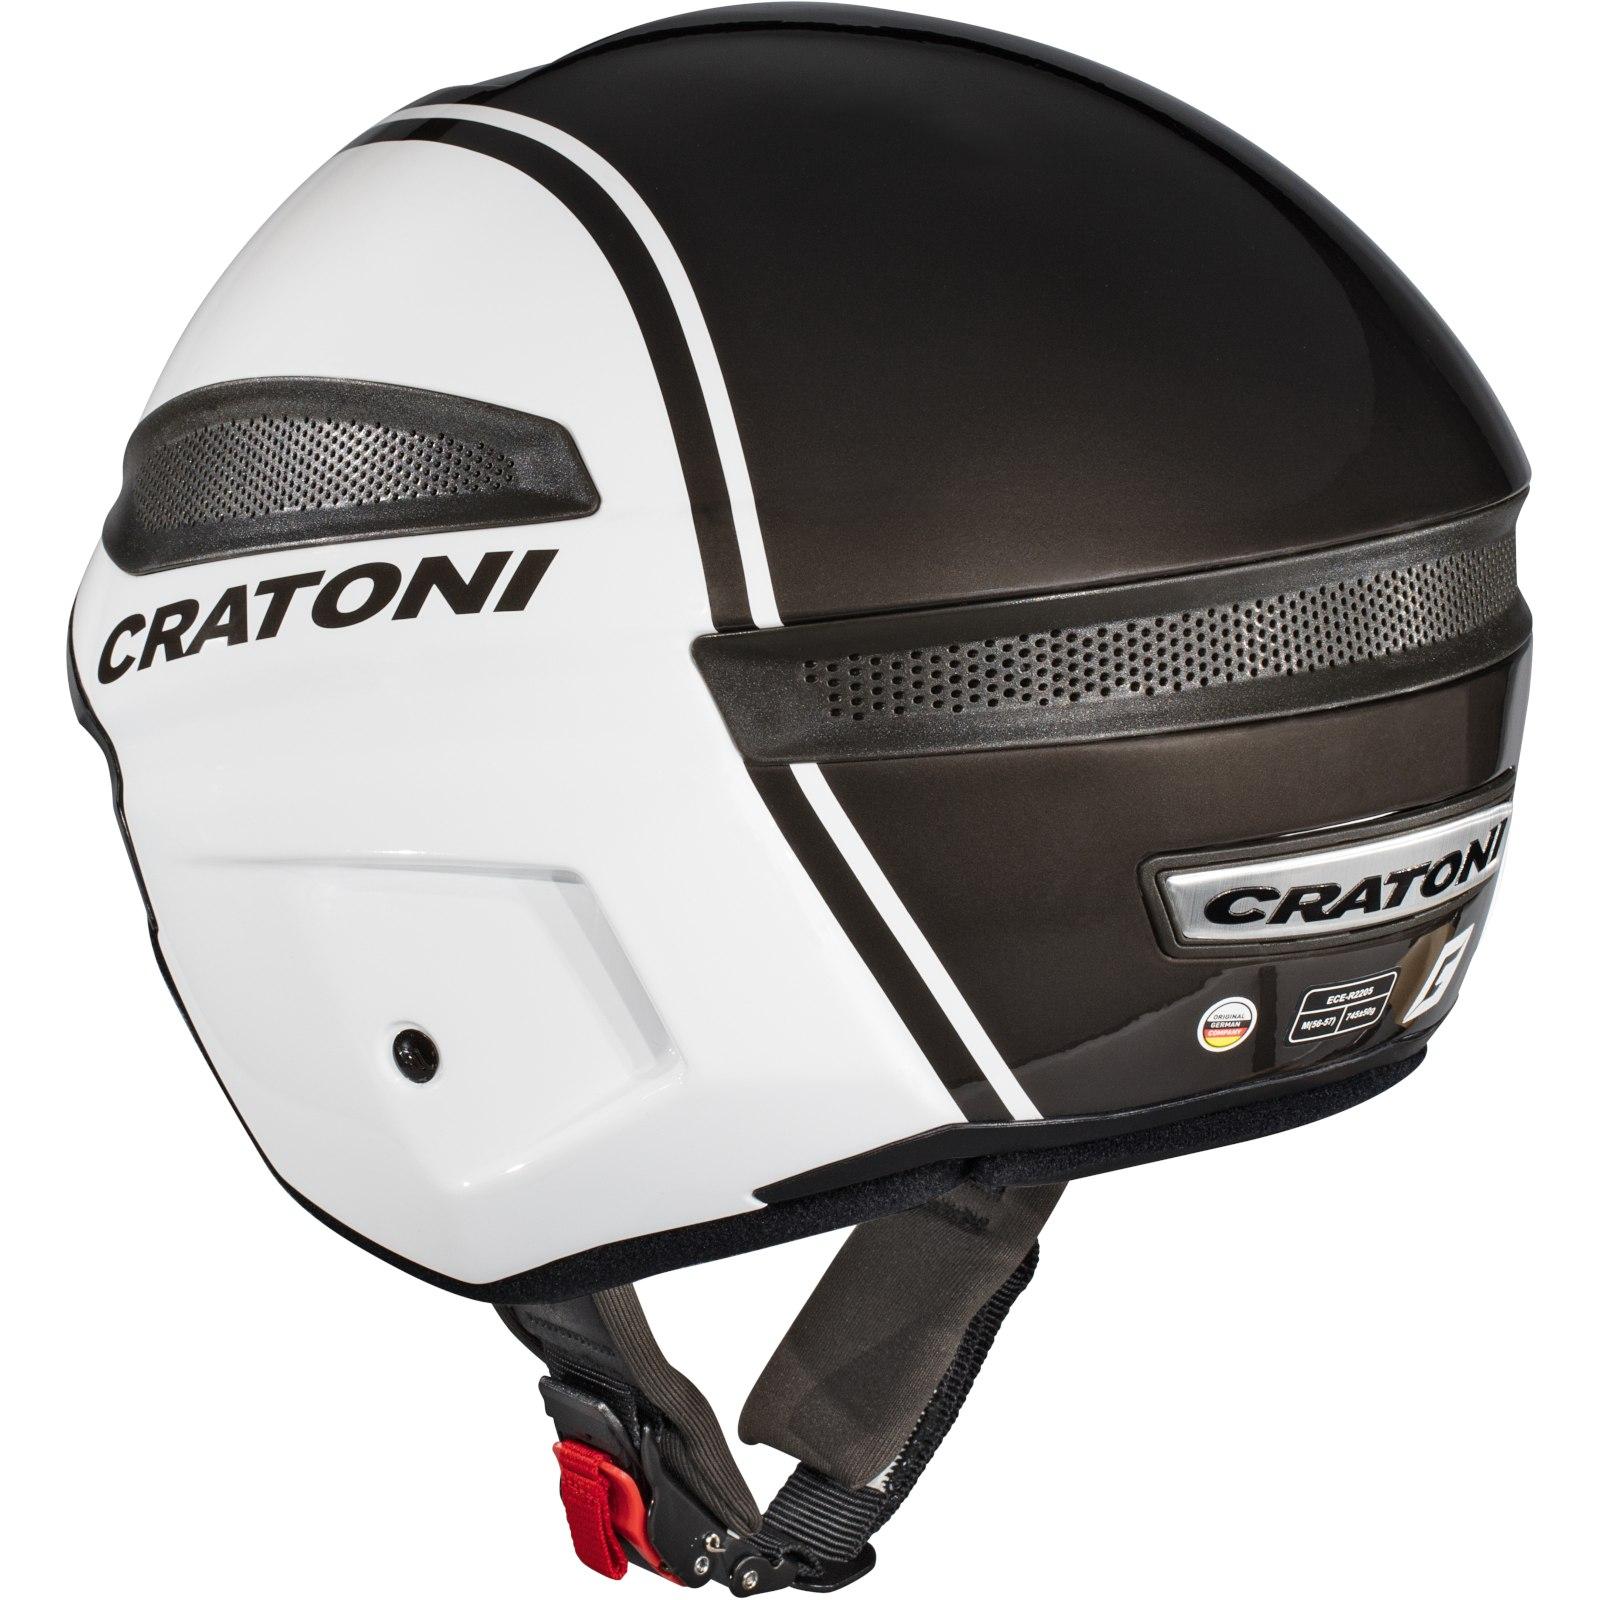 Image of CRATONI Vigor Helmet - white-anthracite glossy